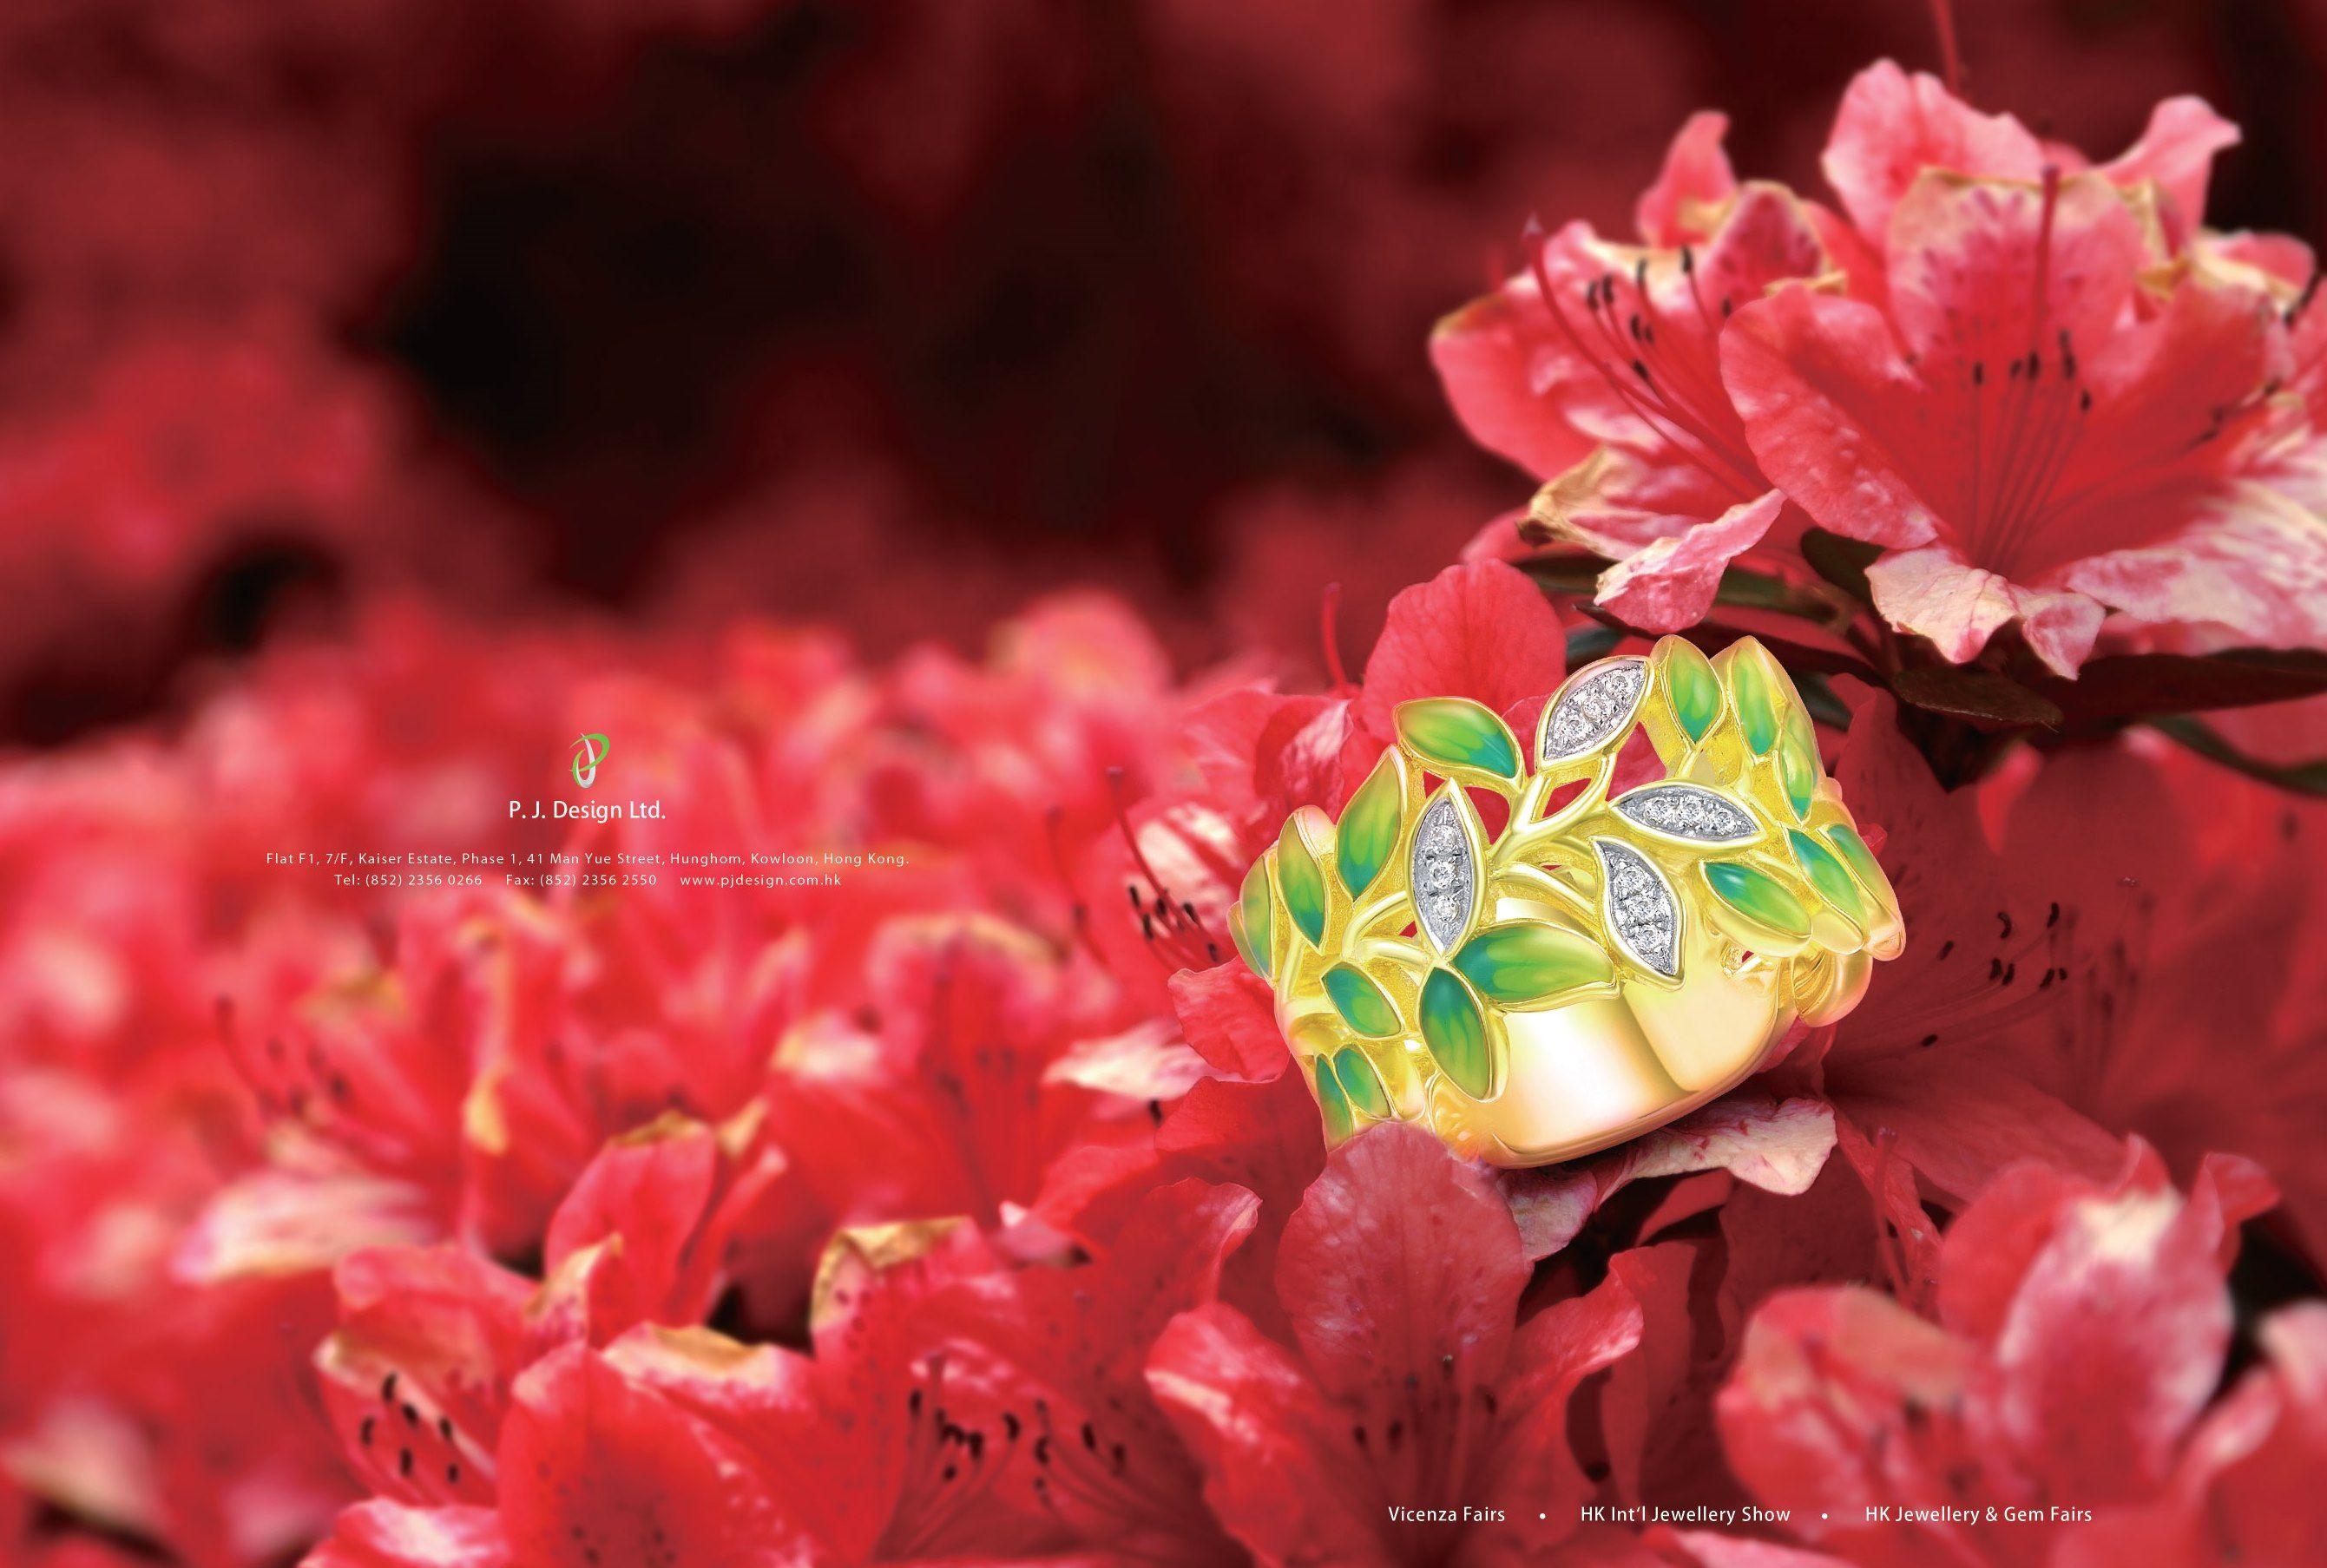 P.J. Design Ltd #HKJE #Magazine #FallWinter2015 #Advertisement #jewellery #diamond #finejewellery